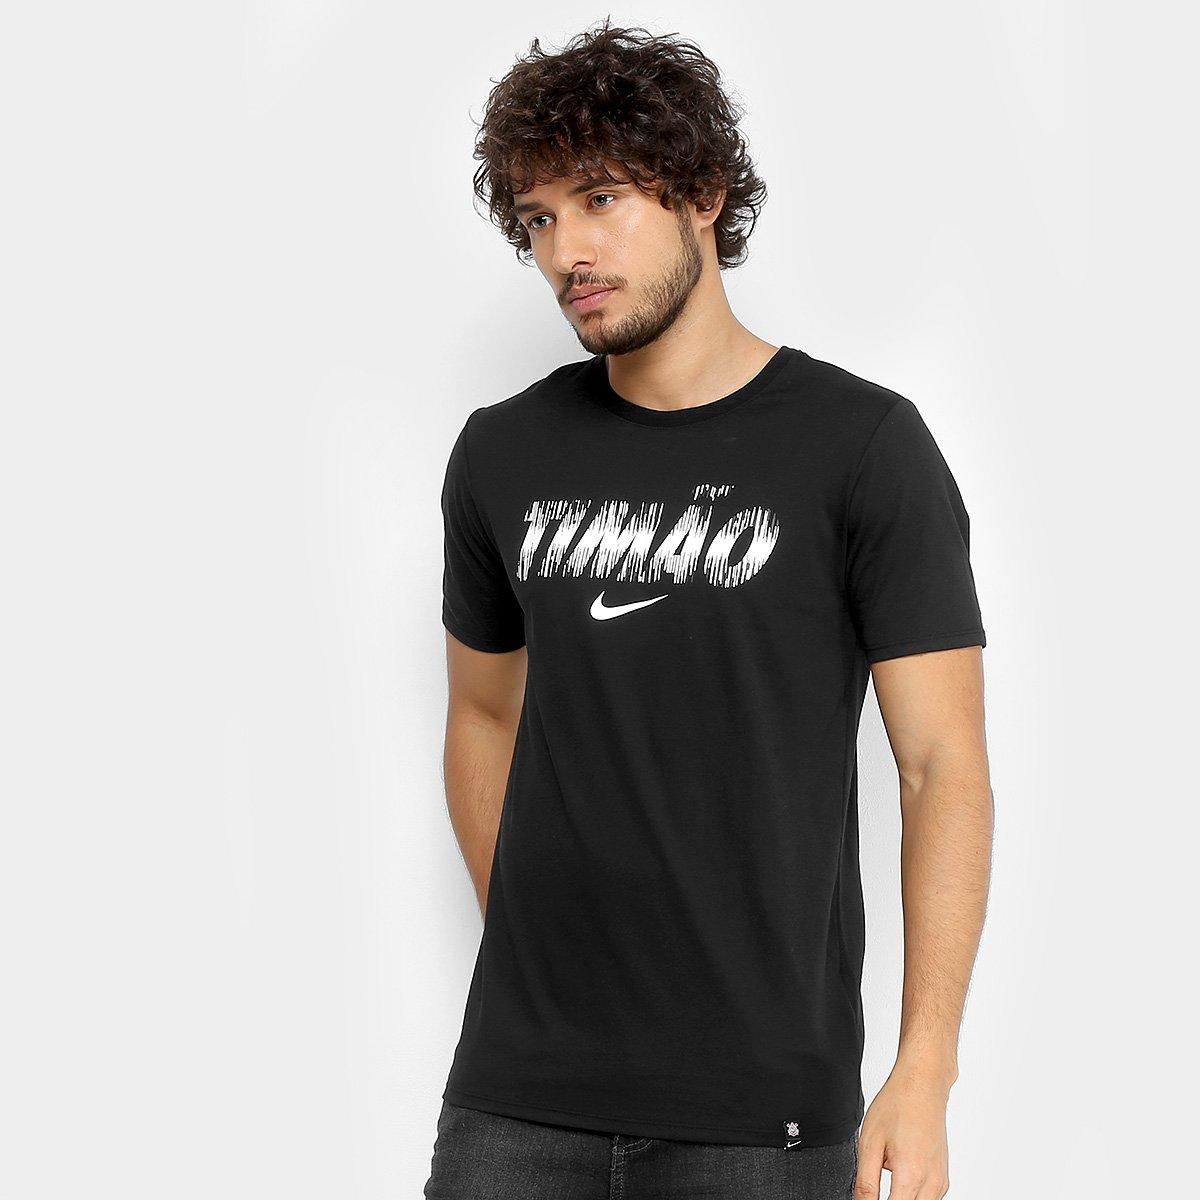 f566f90522 Camiseta Corinthians Nike Dry Masculina - Preto - Compre Agora ...